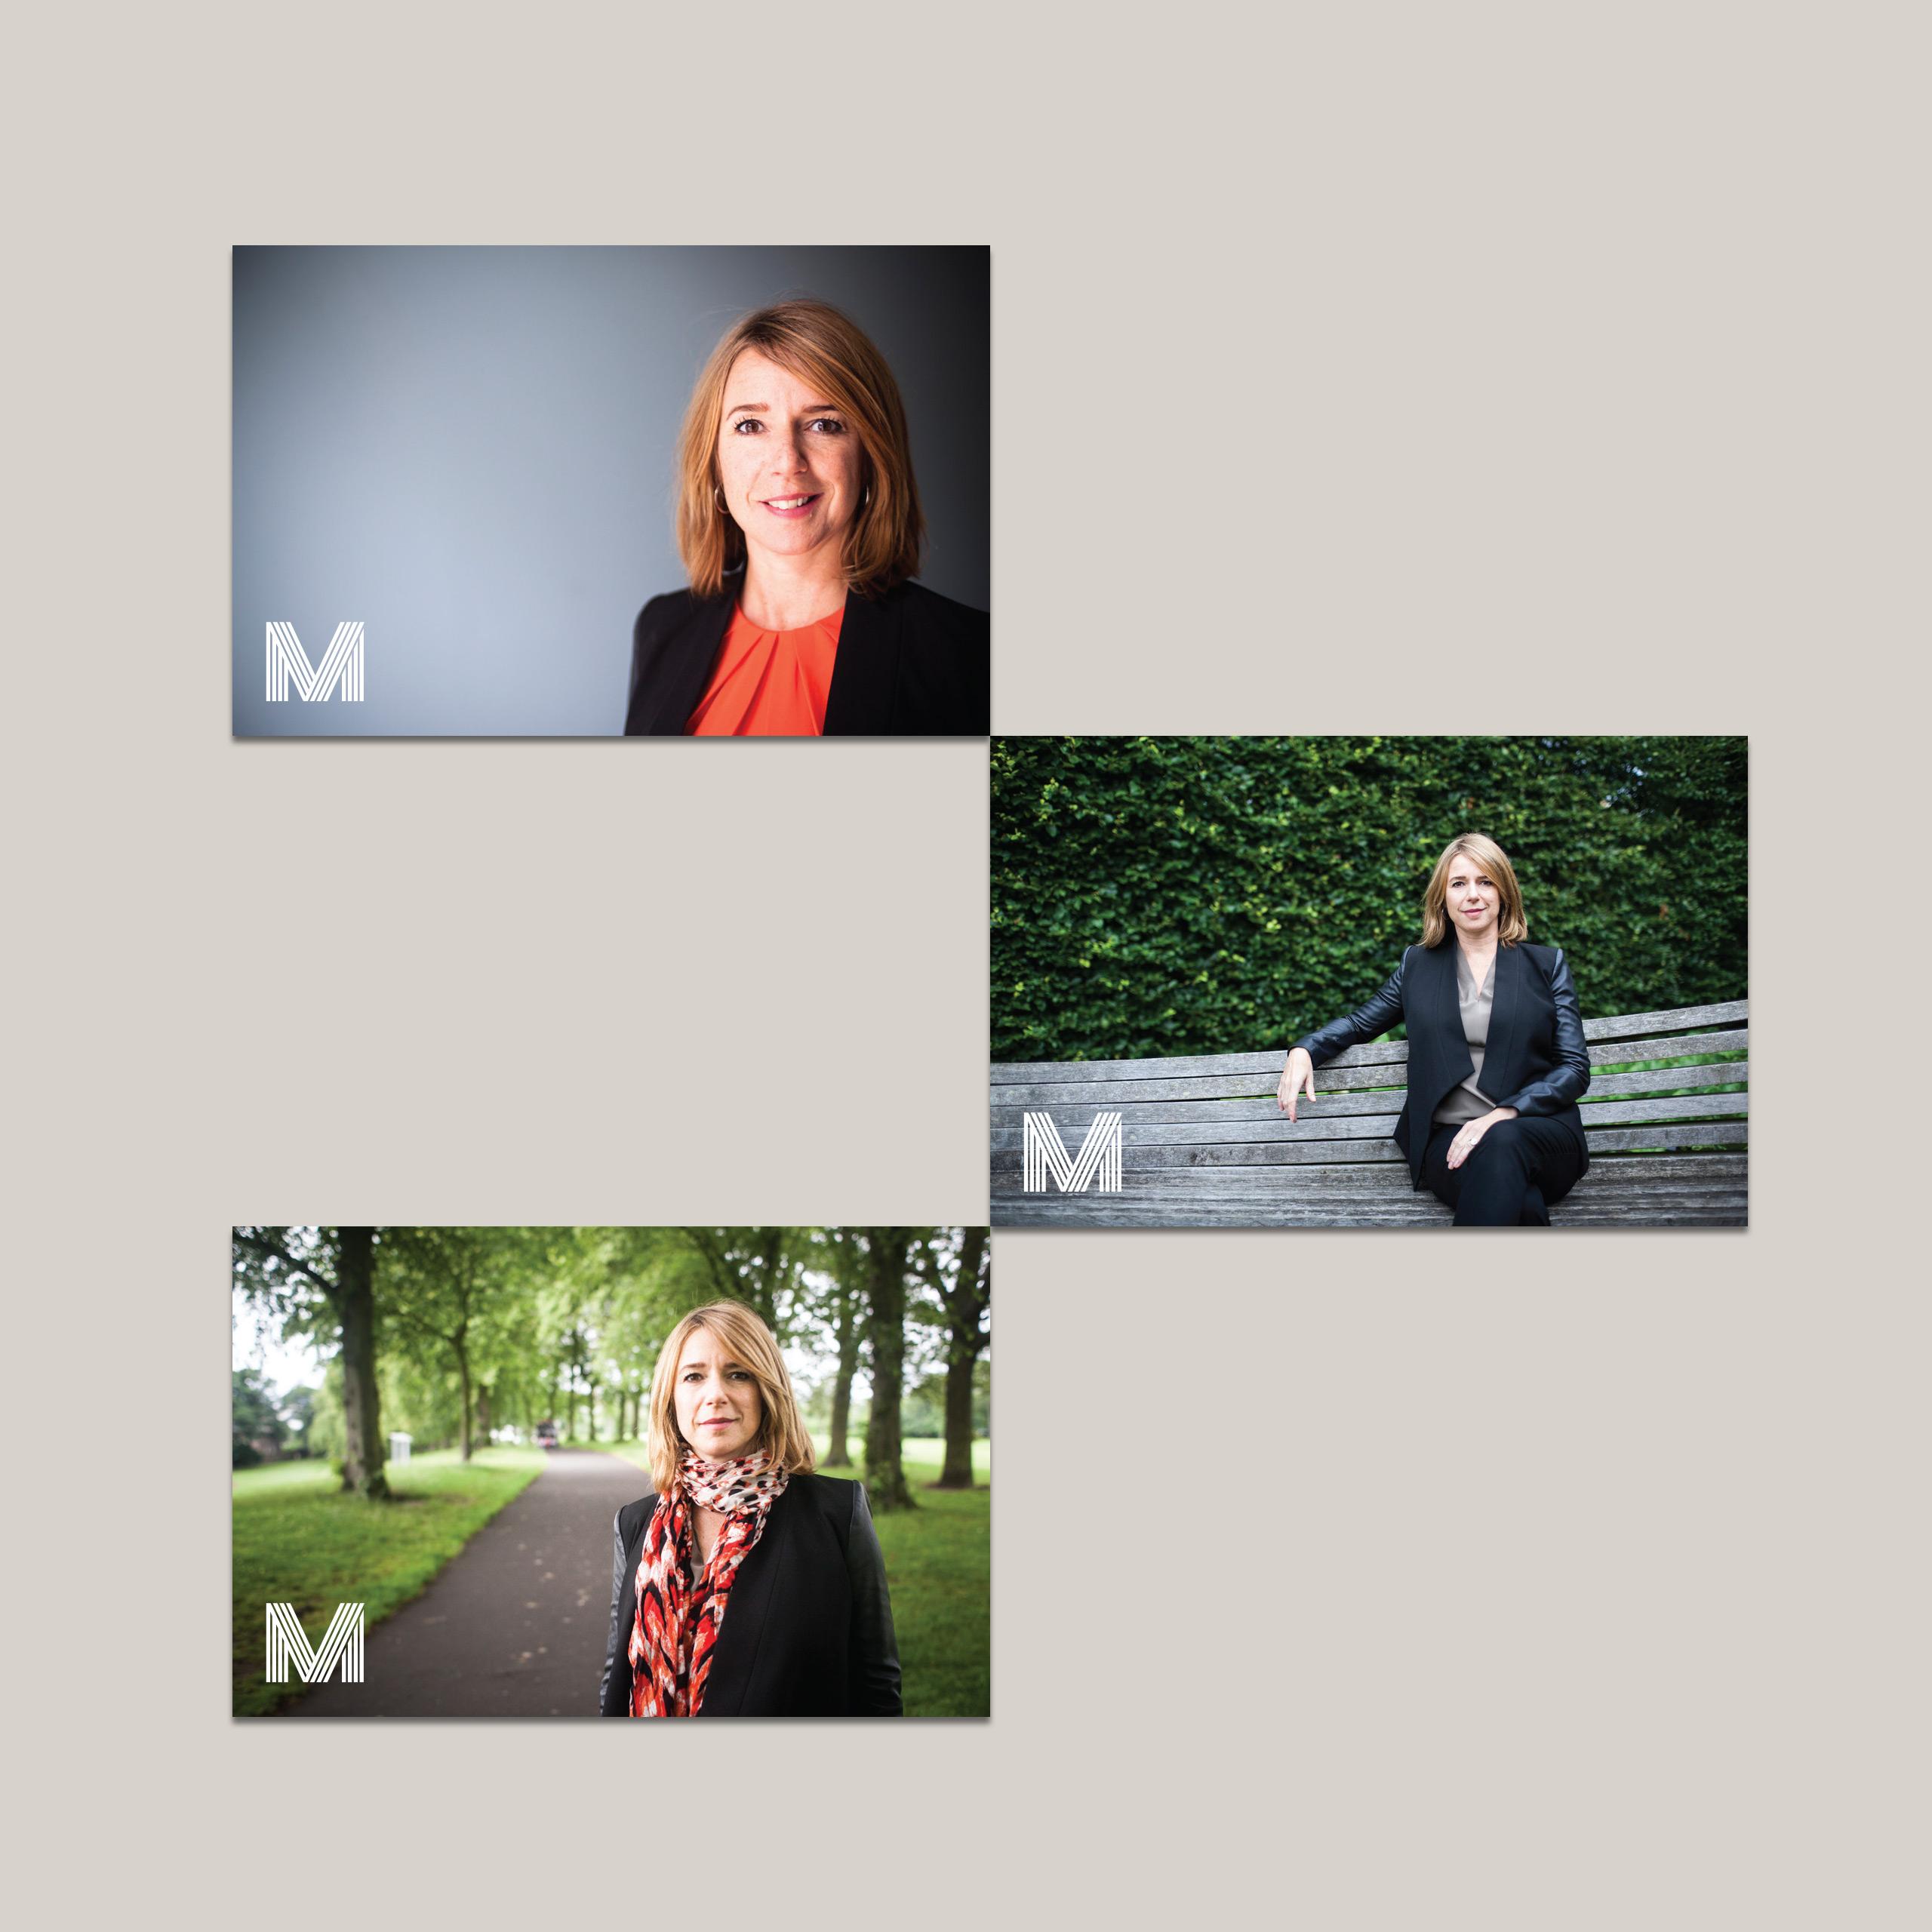 Mairi Mickel's Business Families